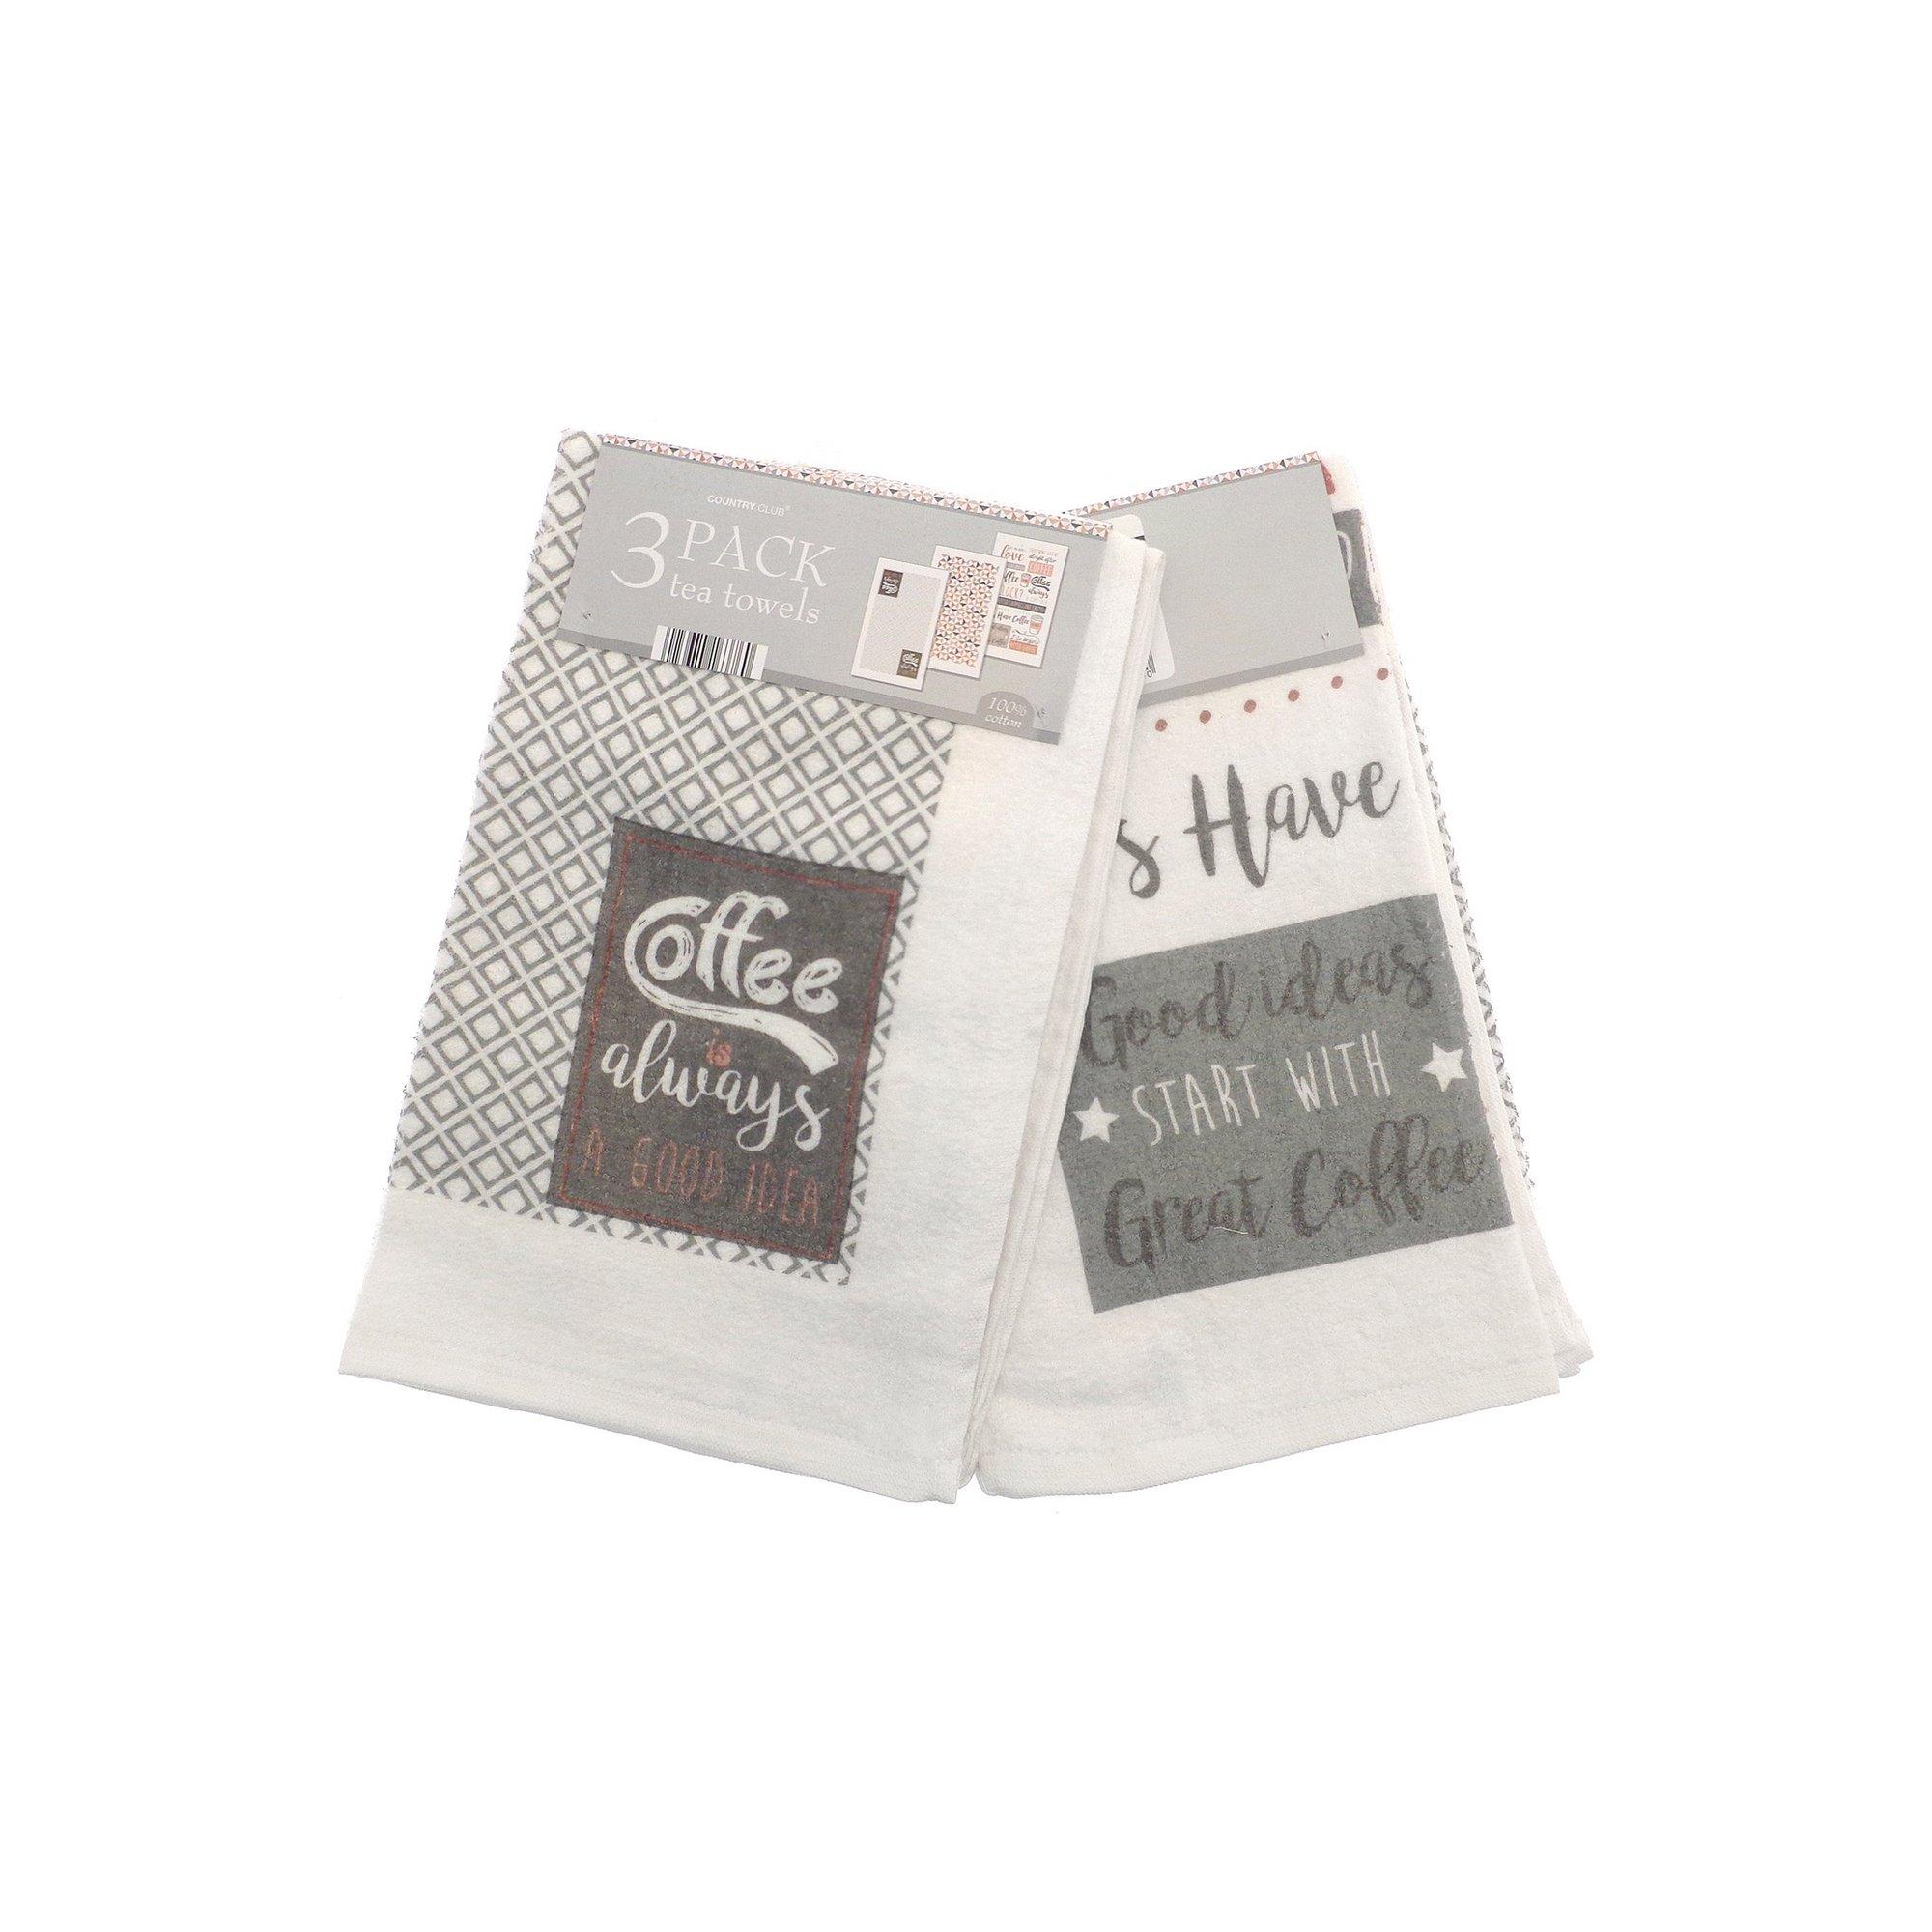 Image of Pack of 3 Velour Tea Towels - Coffee